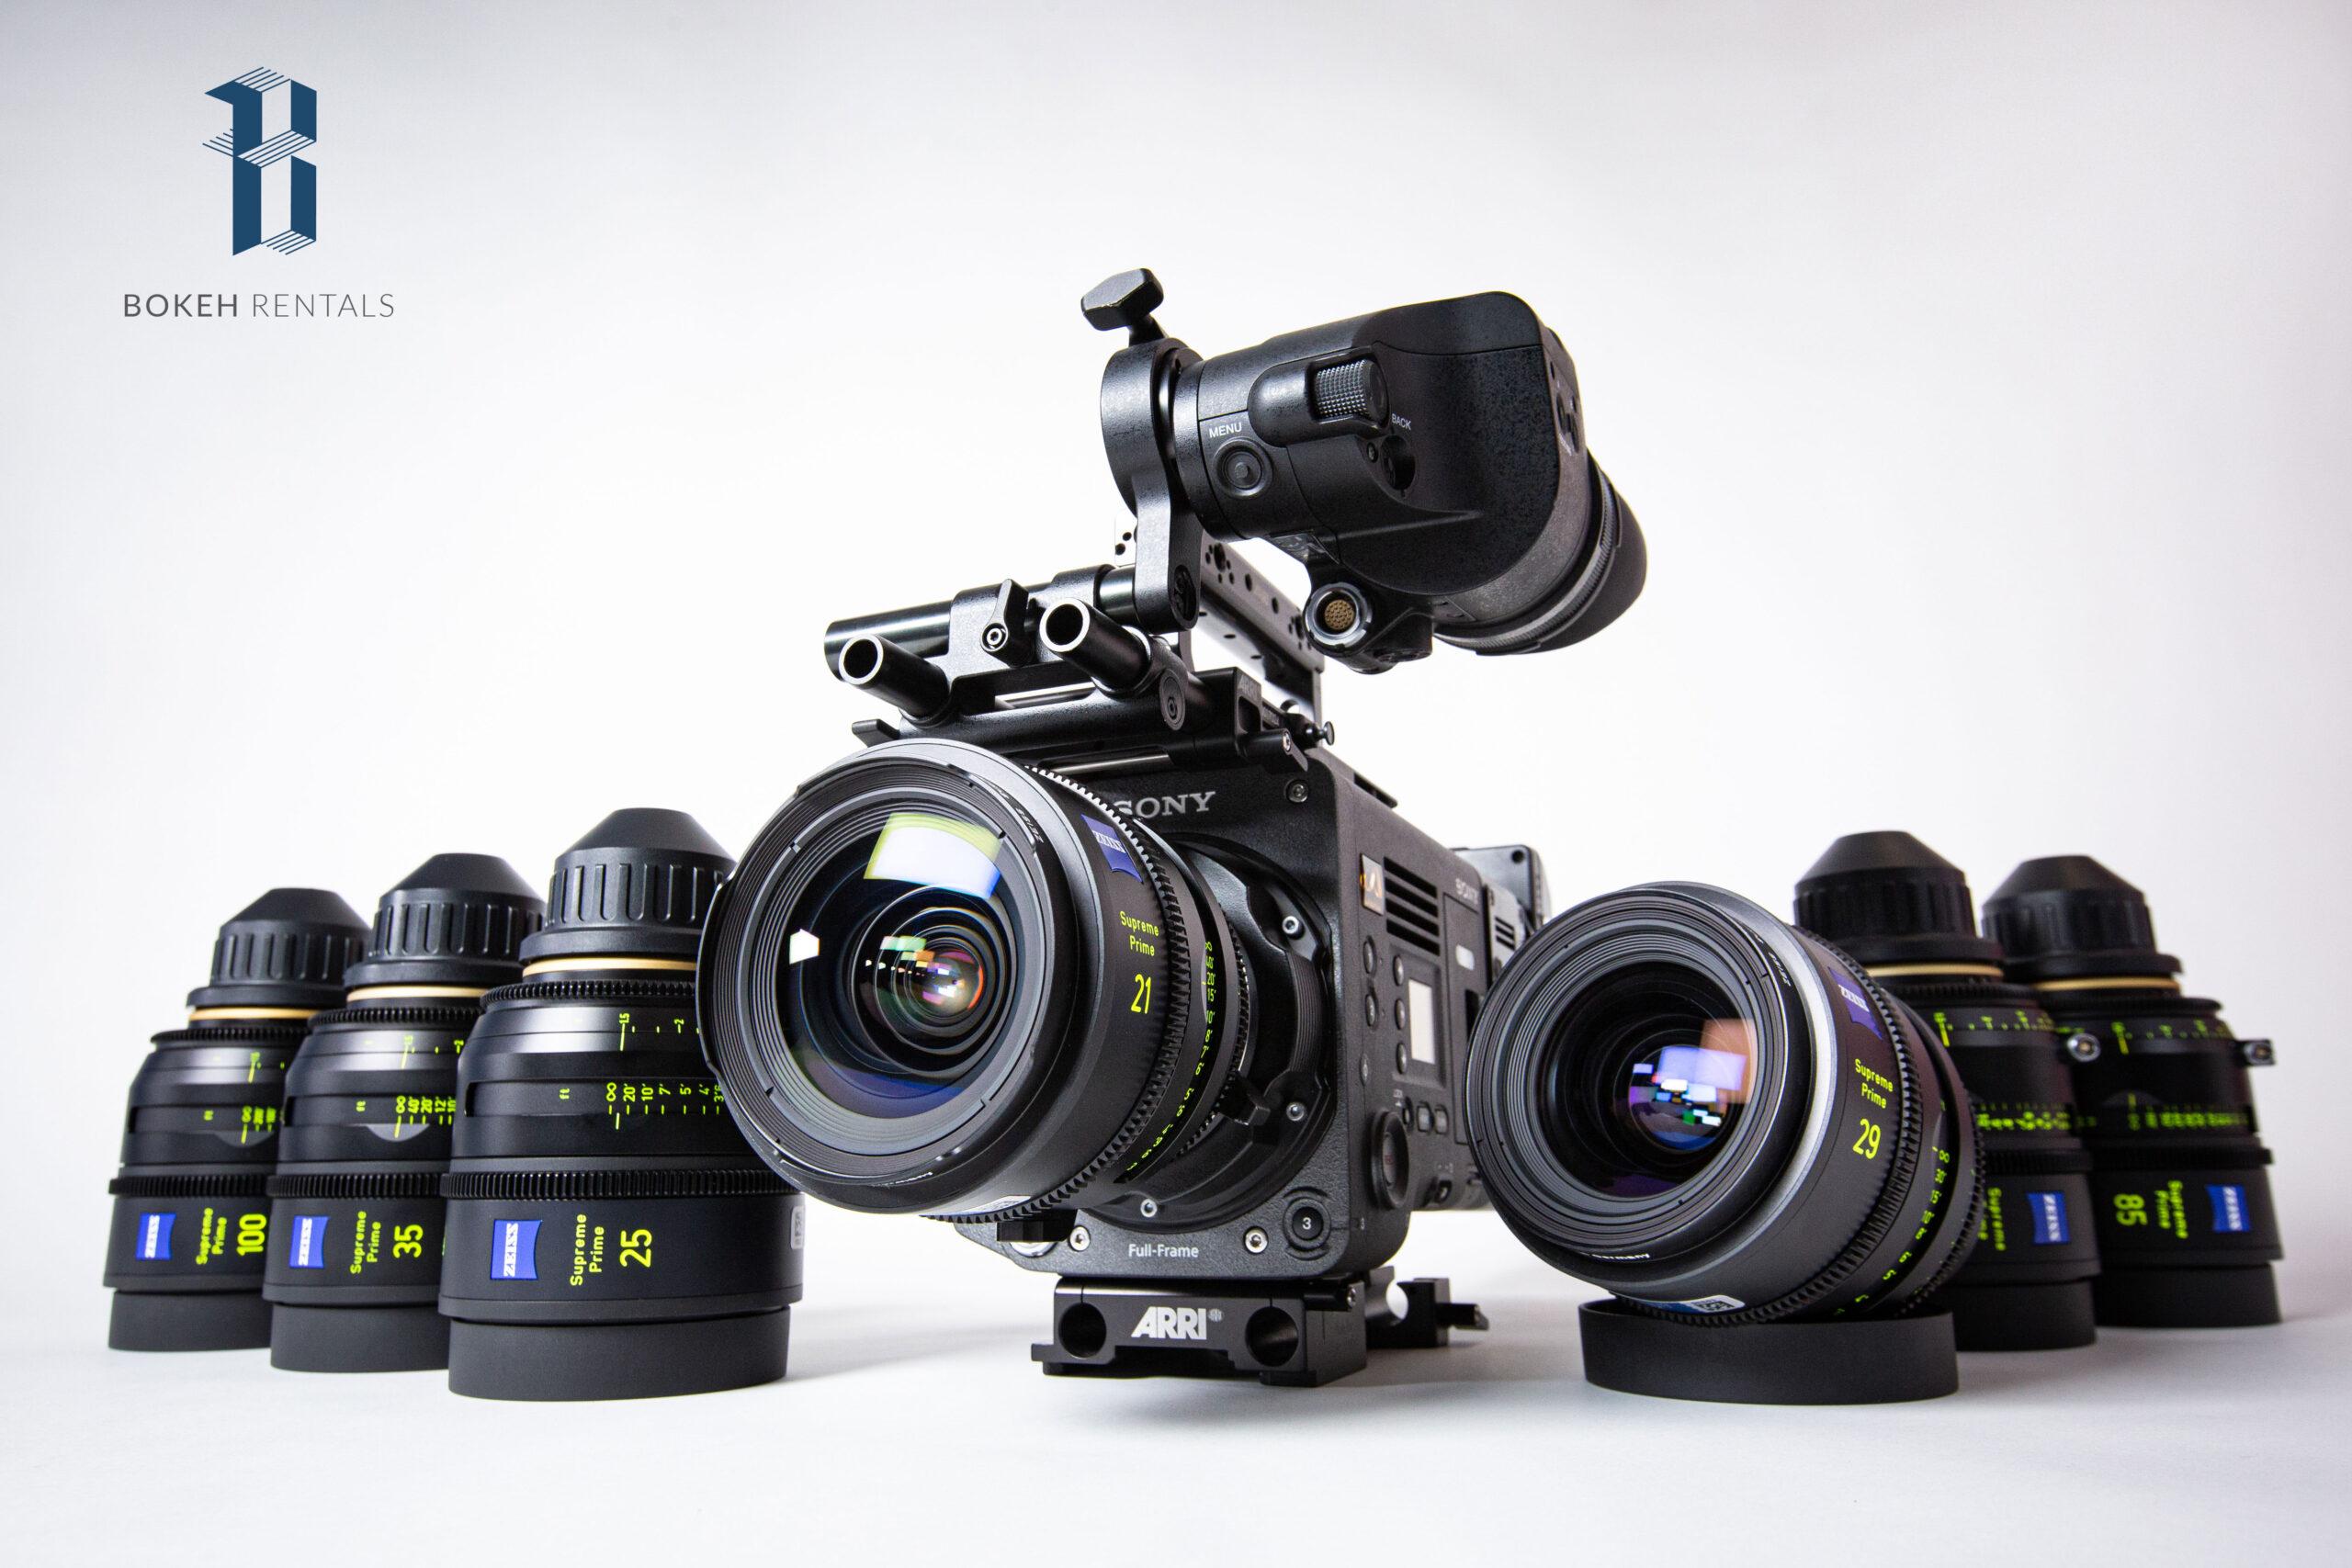 Sony VENICE Full Frame 6K CineAlta Camera w/ ZEISS Supreme Radiance Set